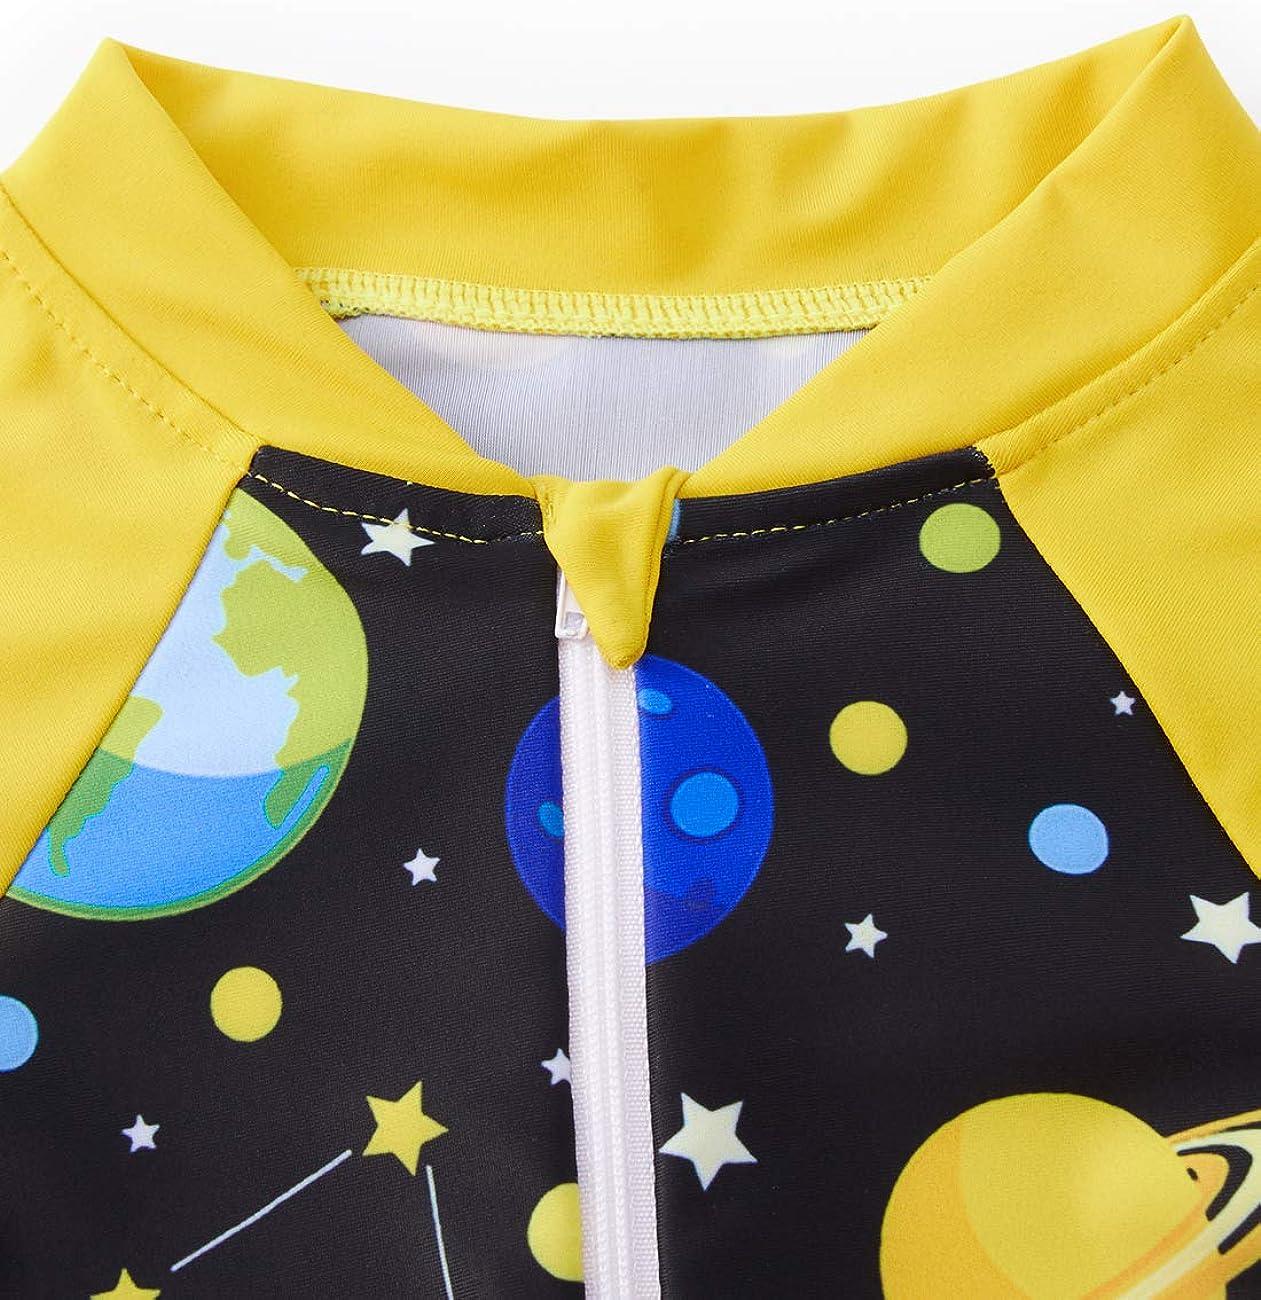 One Piece Long Sleeve Beach Swimwear Bathing Suit Fanient Girls Zipper Rashguard Swimsuit with UPF50